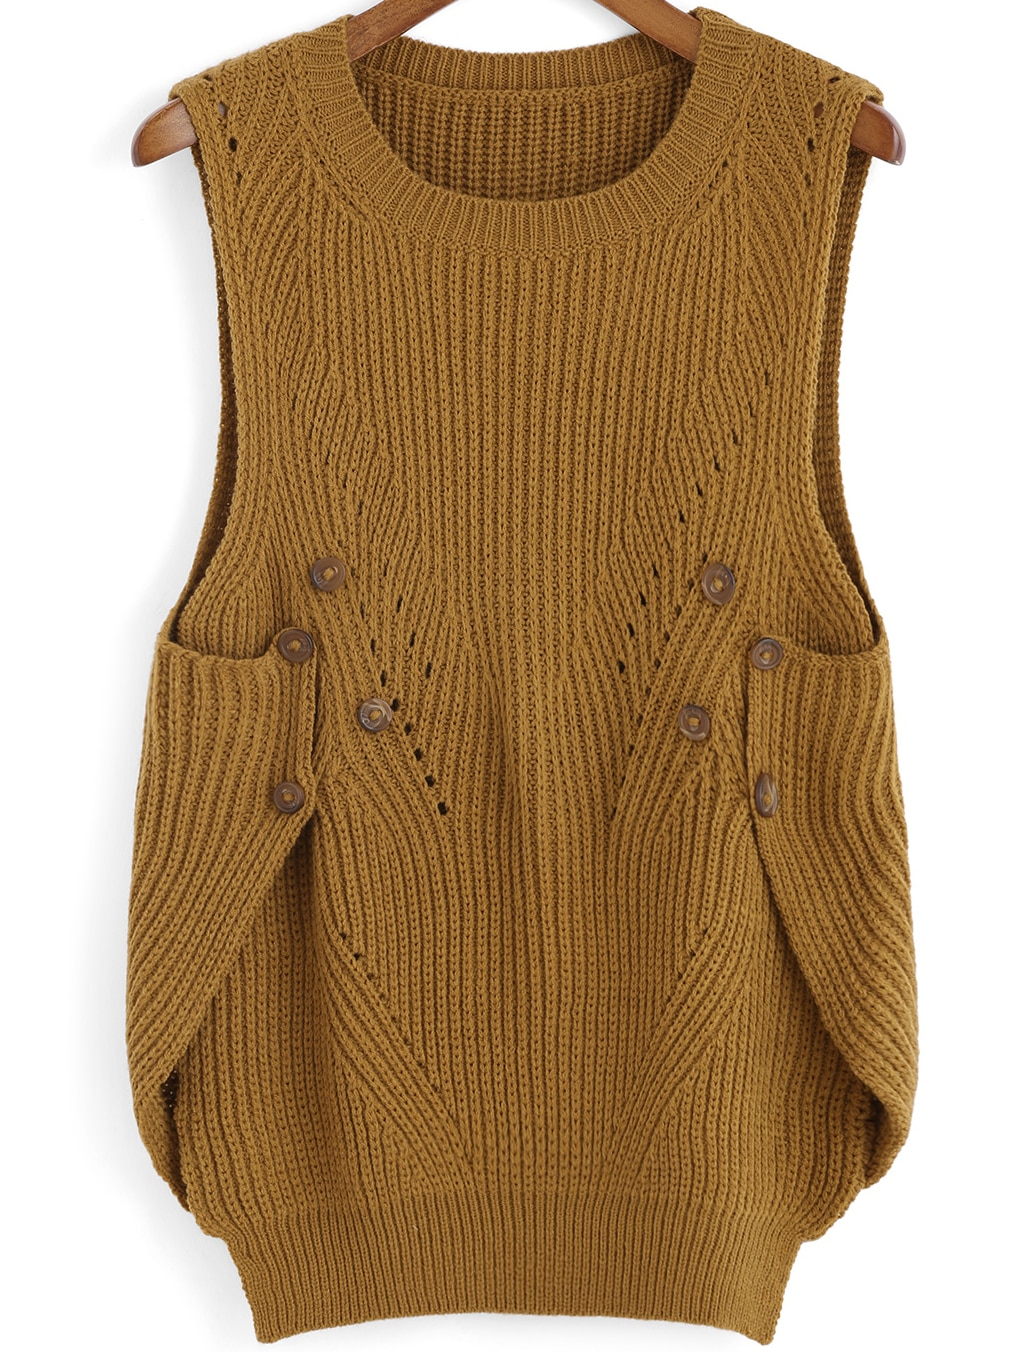 Khaki Round Neck Buttons Knit Sweater -SheIn(Sheinside)